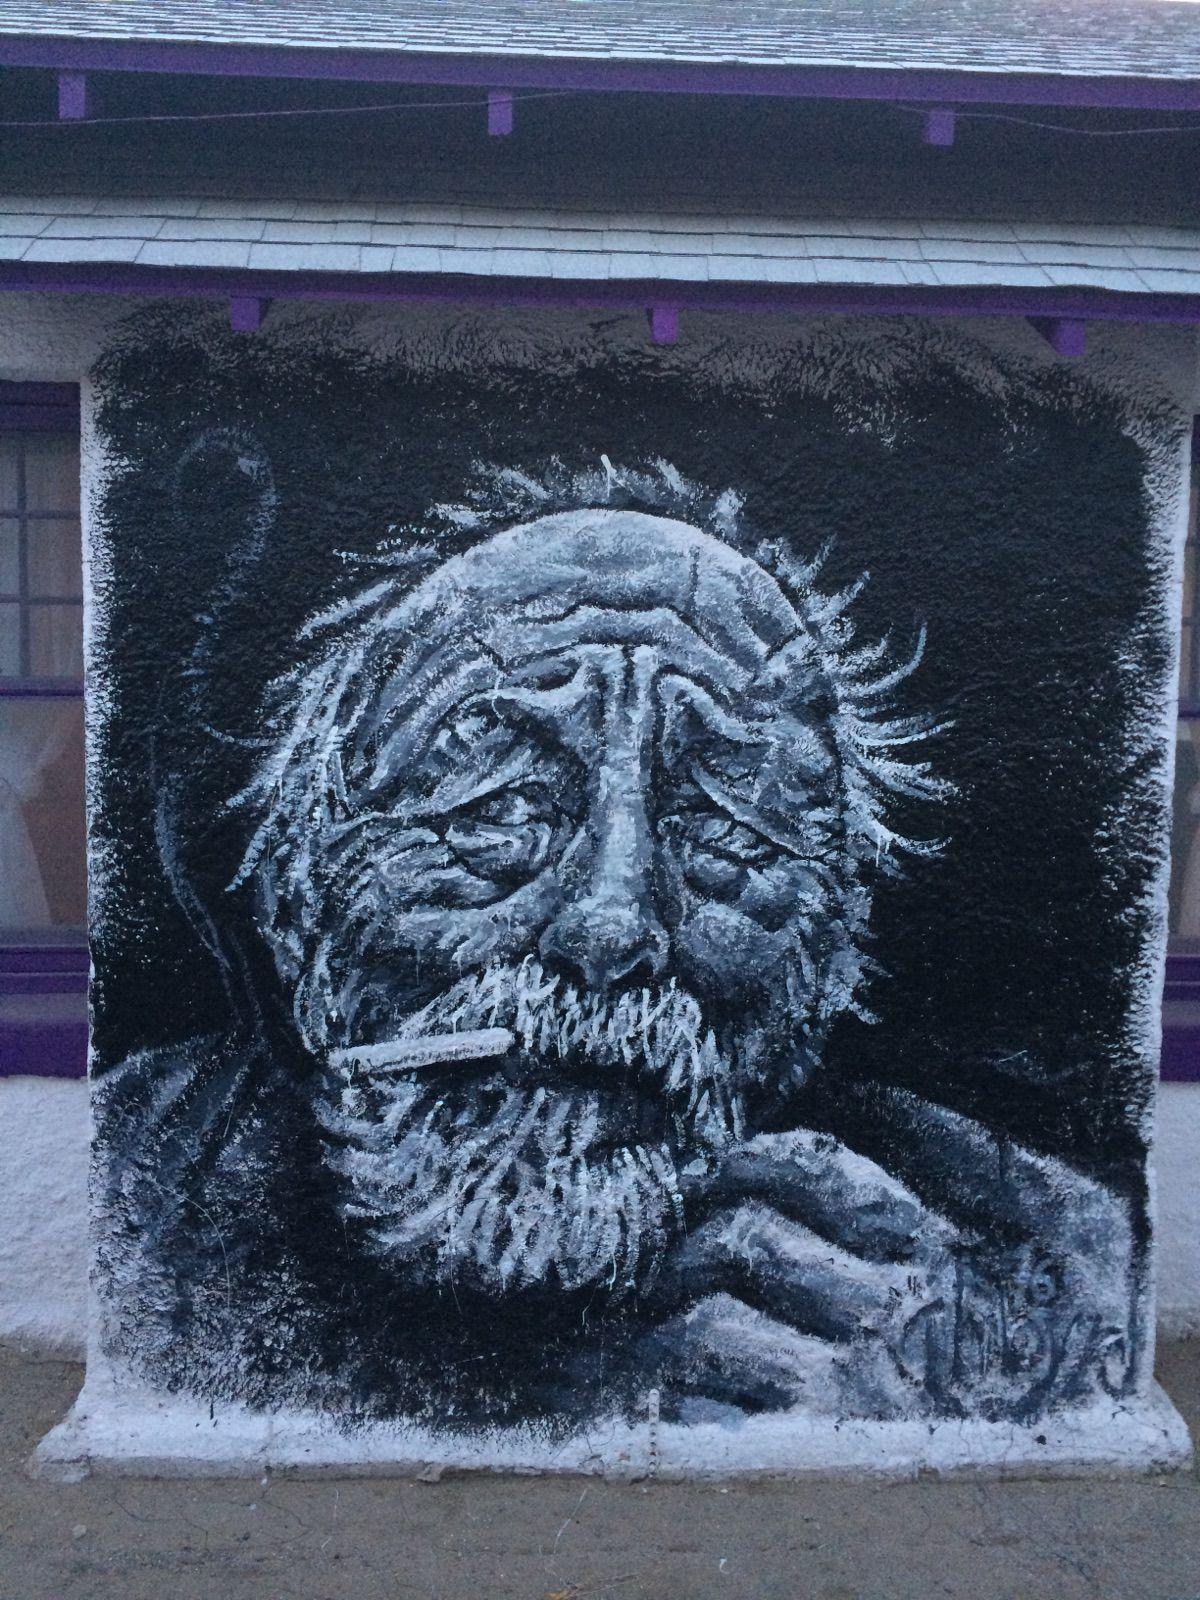 Jim Harrison mural on the wall of NABF Executive Director Jesse Sensibar's Tucson Home. Image courtesy of Jesse Sensibar.